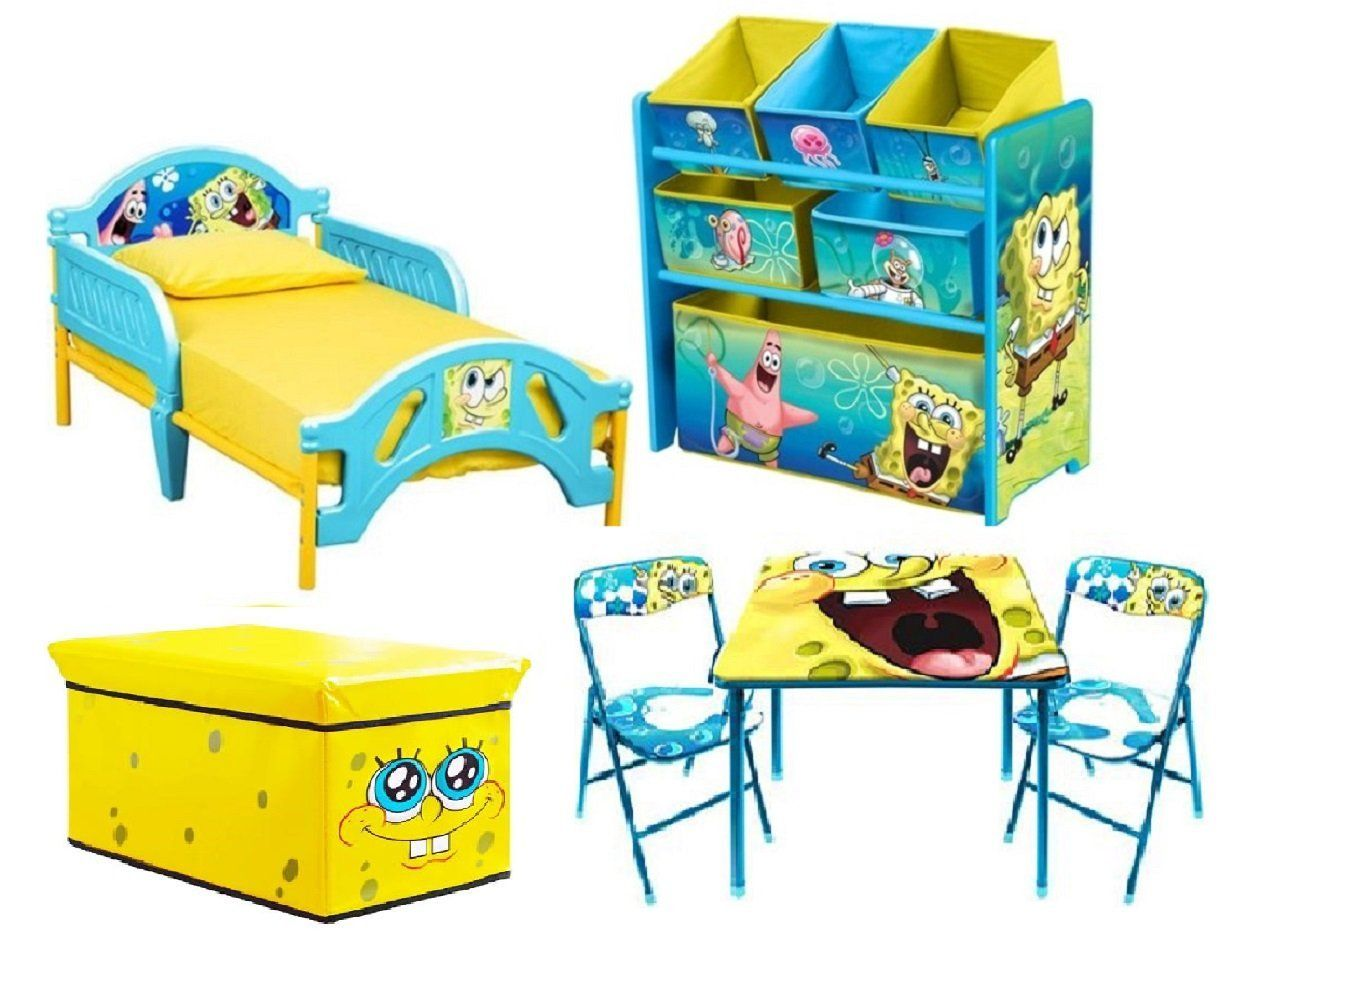 Spongebob Toddler Bedroom Bundle Set Bed Toy Bin Organizer